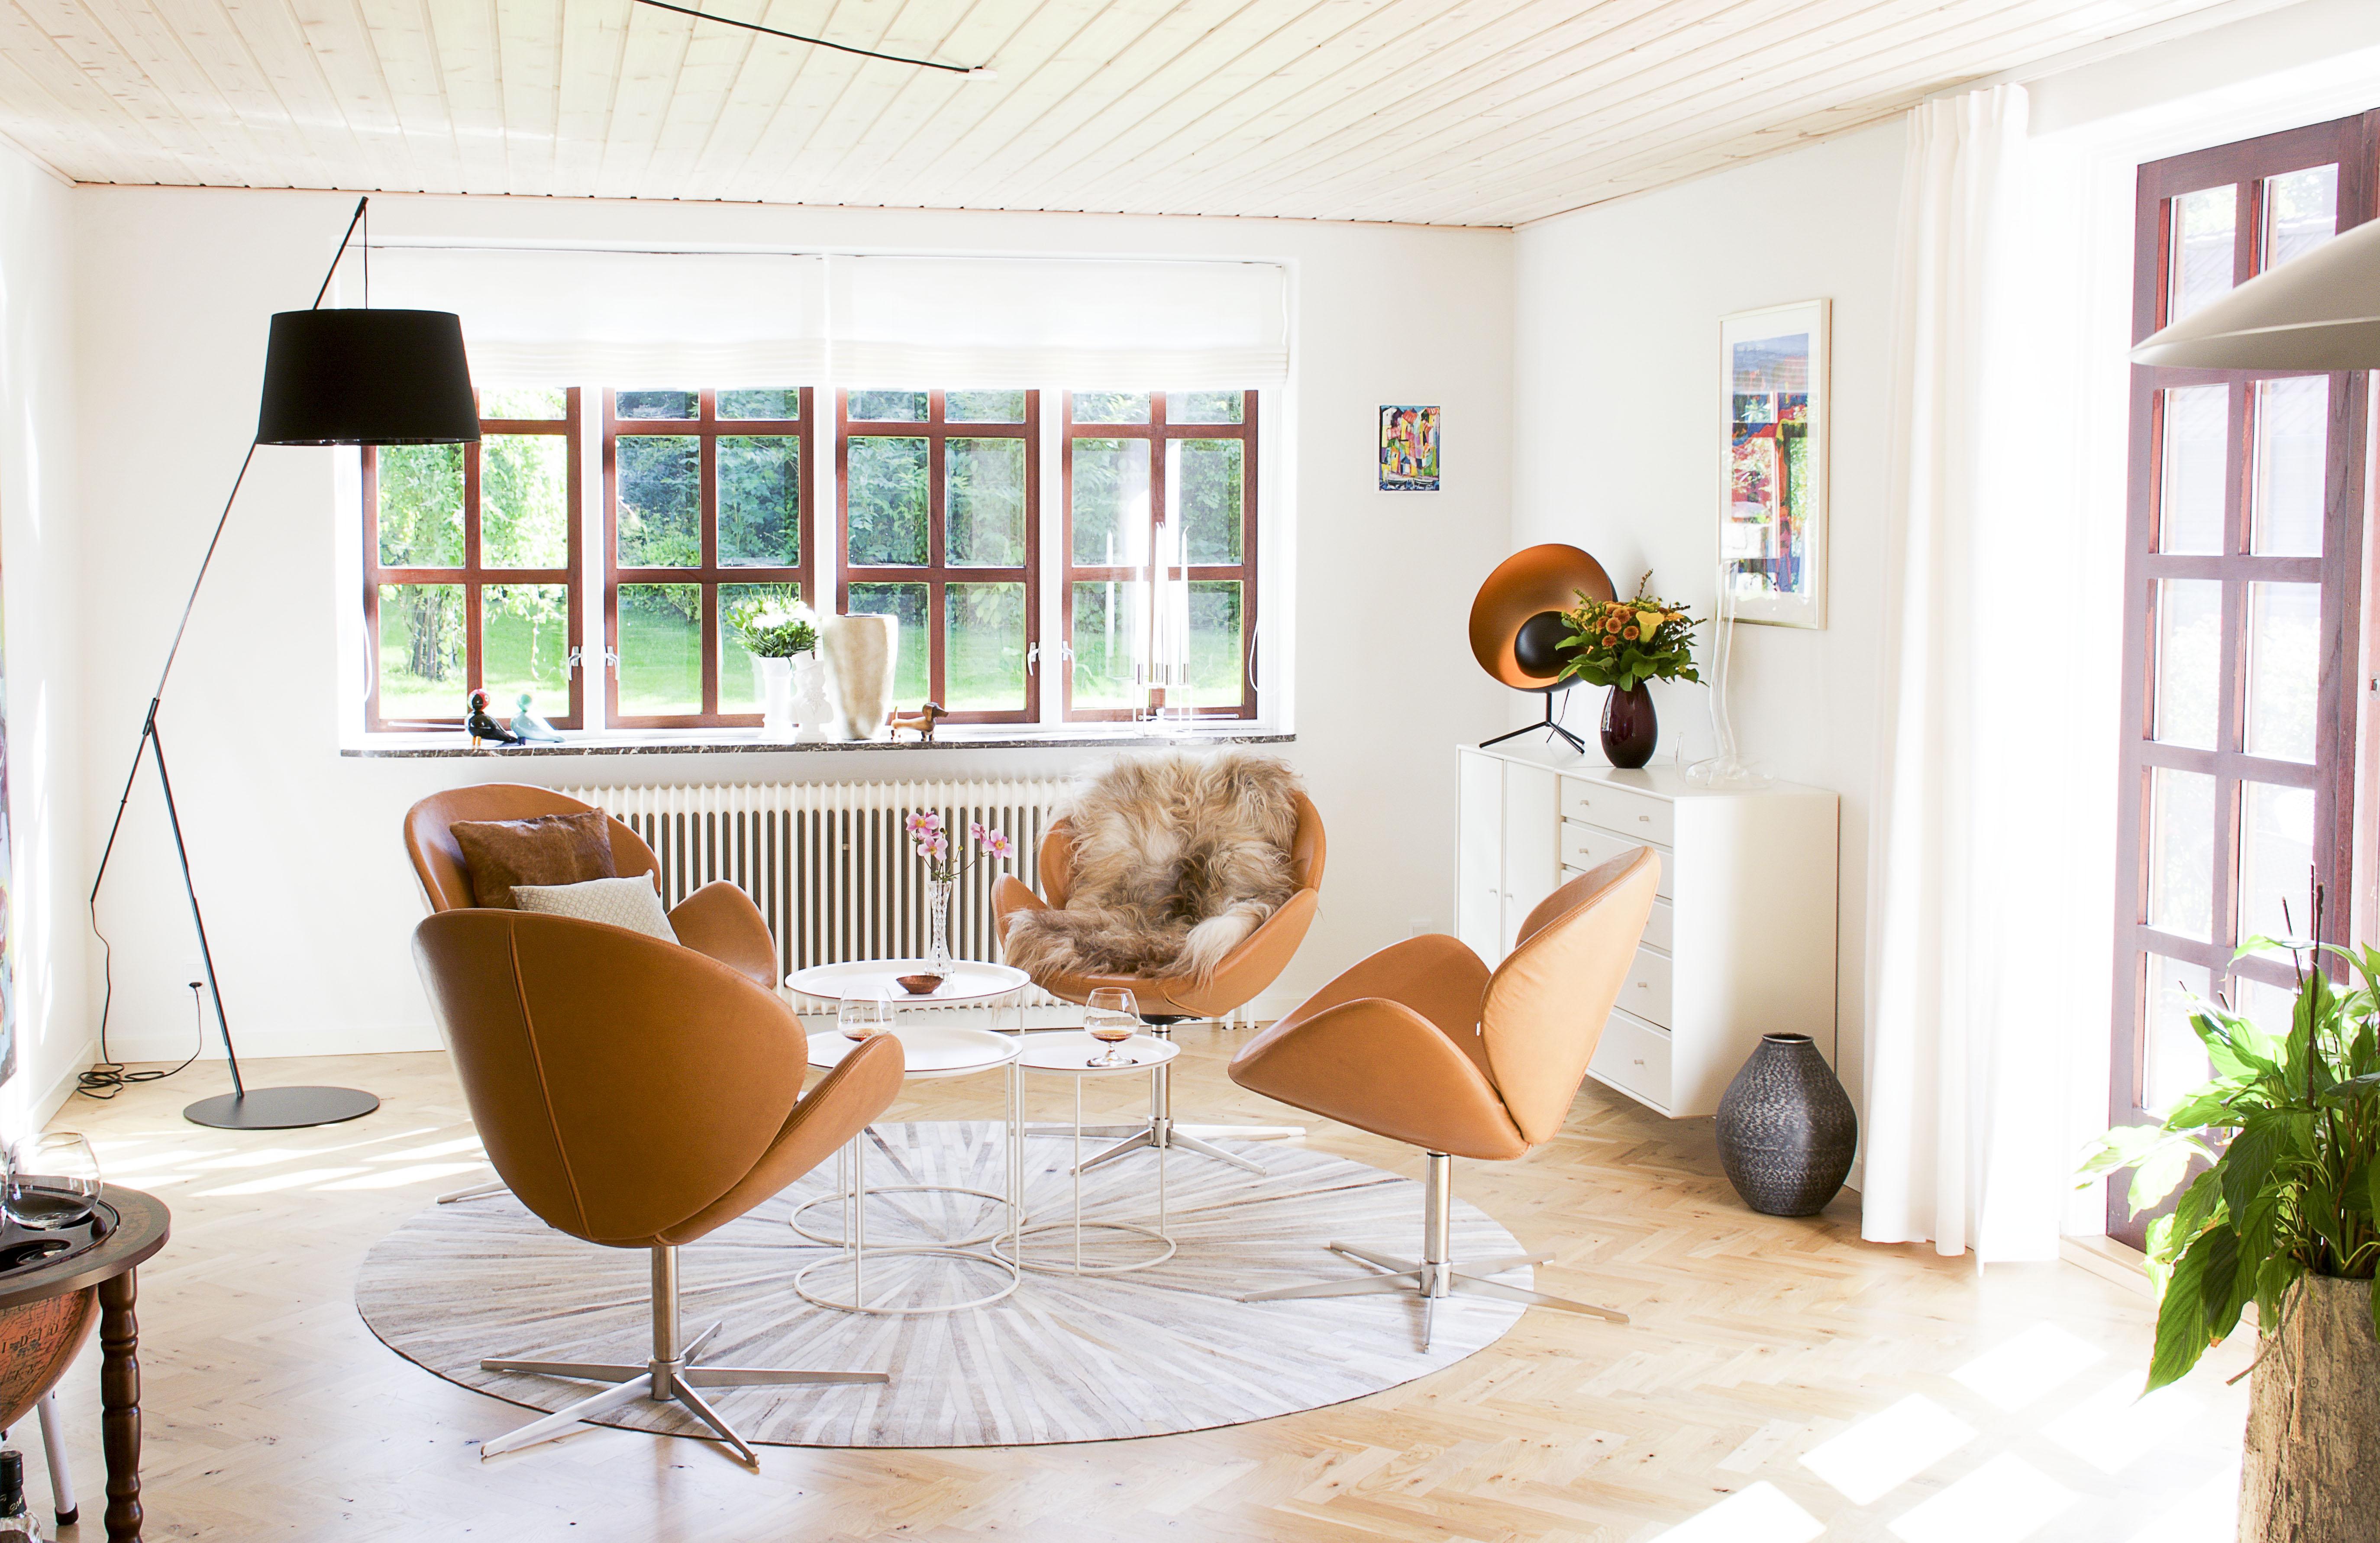 Privat indretning, aarhus 2015